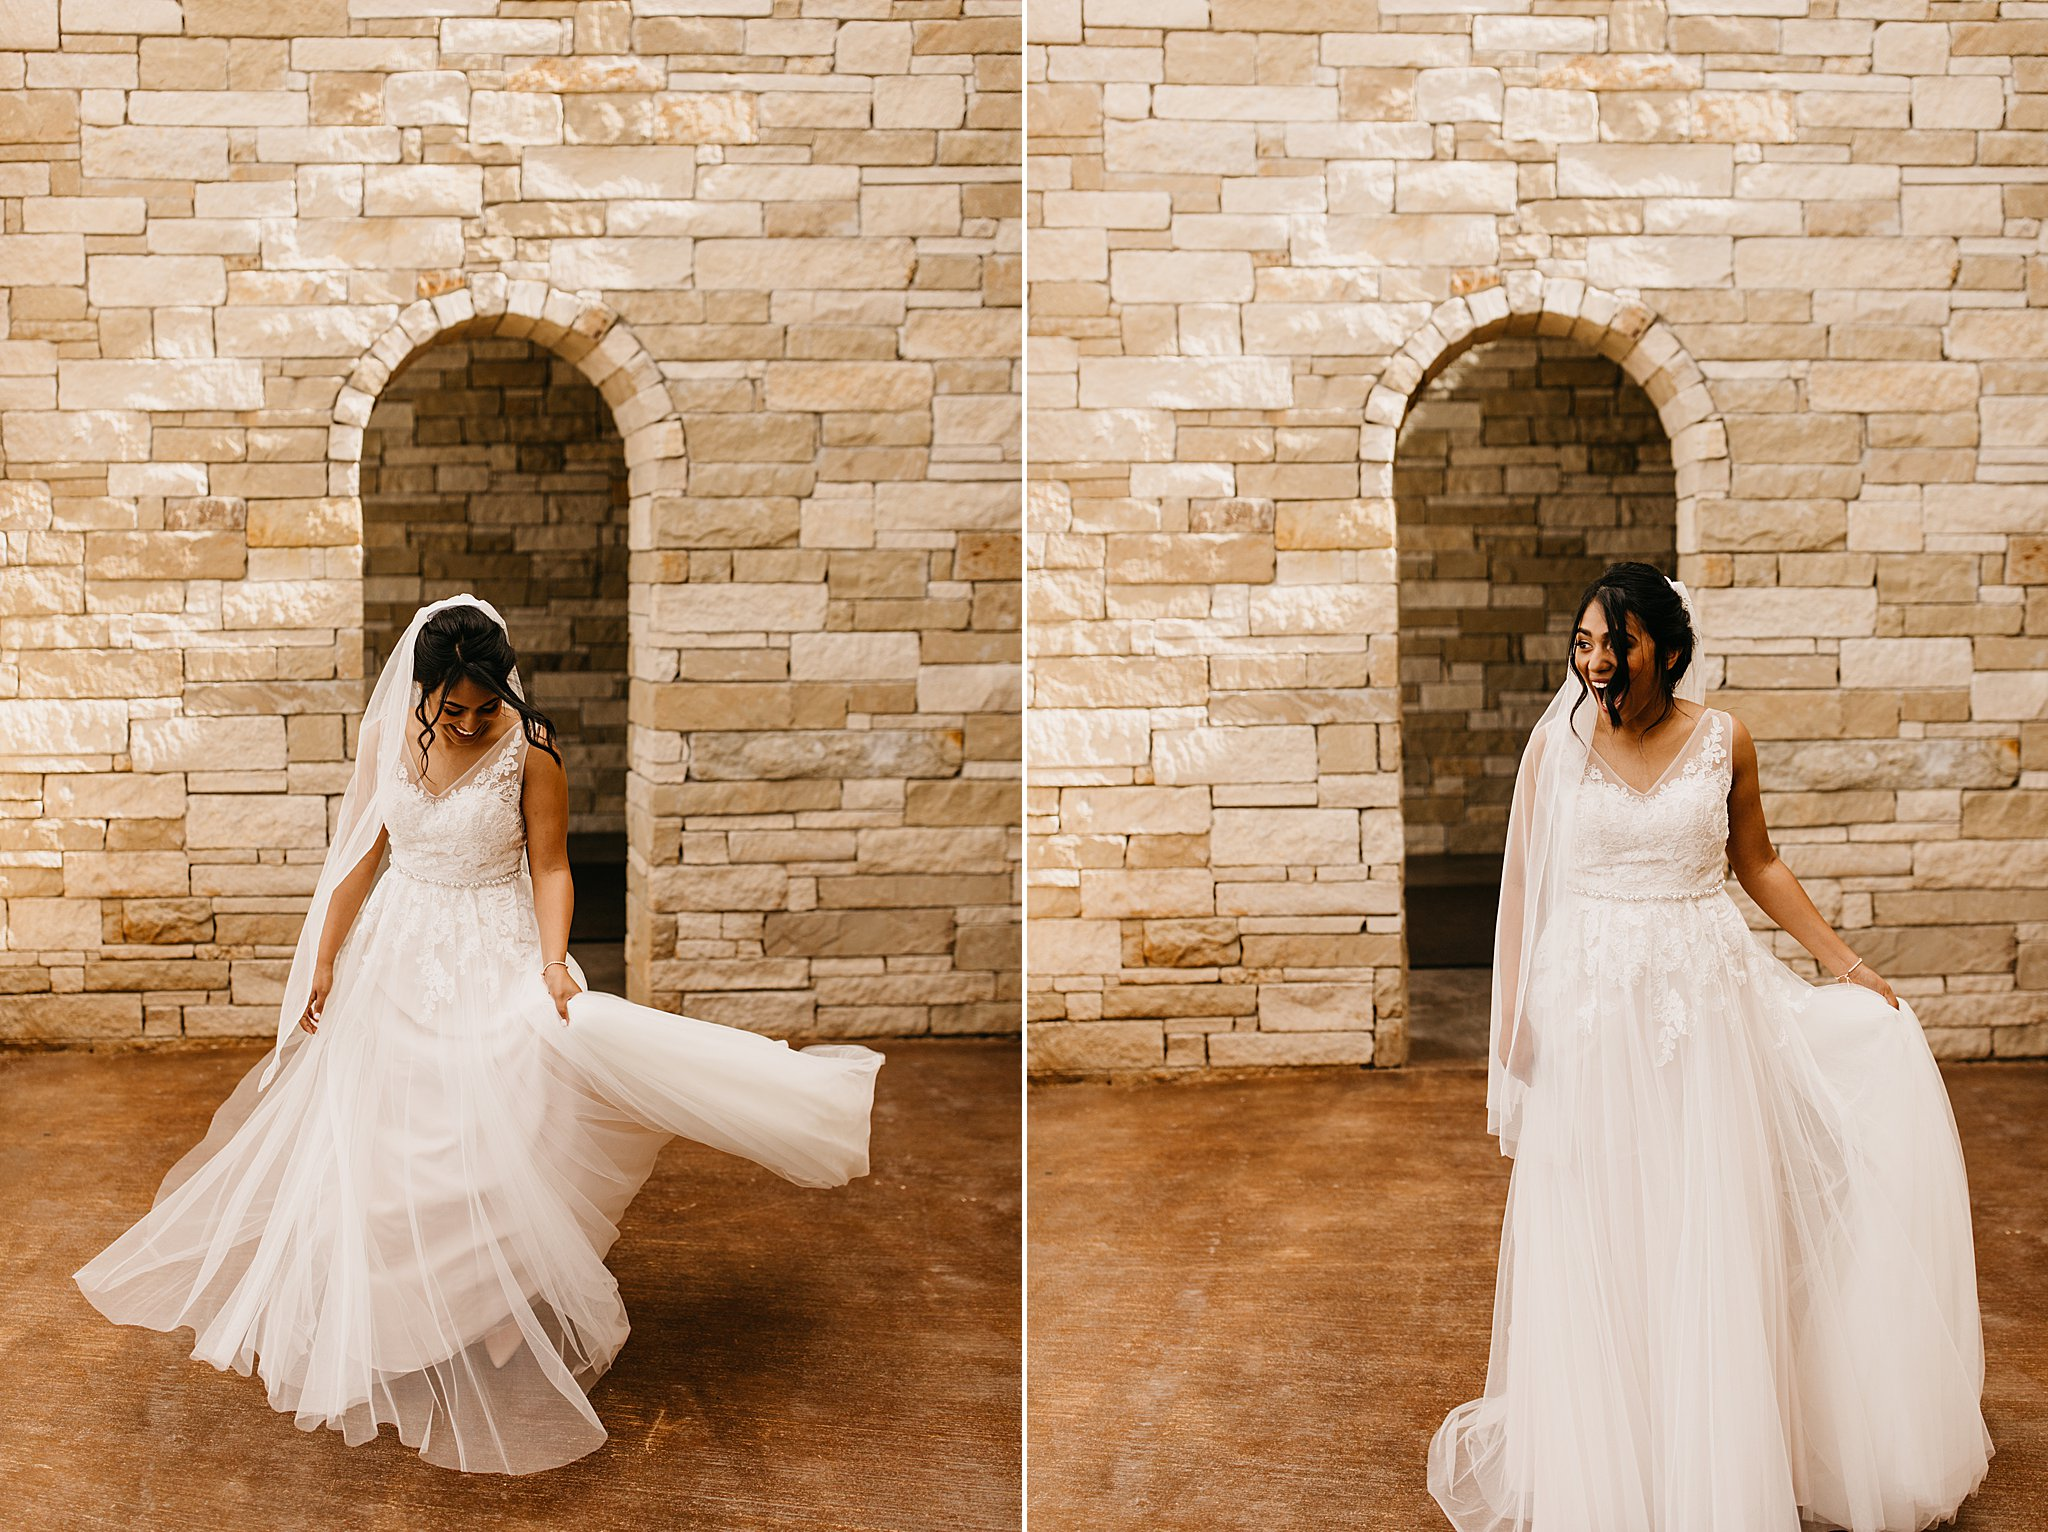 Wilderlove Co_Dripping Springs Texas_Texas Hill Country Wedding_Photography_0030.jpg